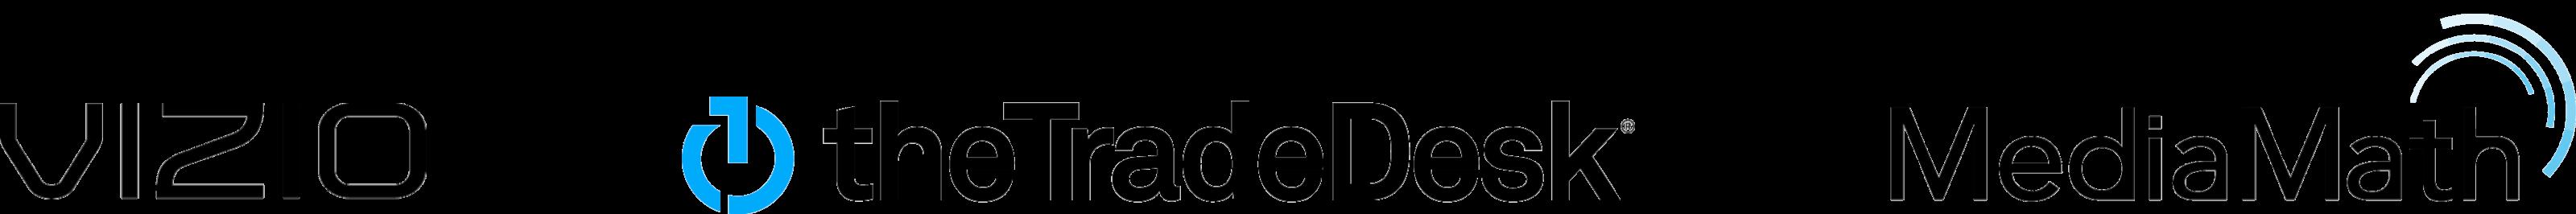 vizio theTradeDesk MediaMath